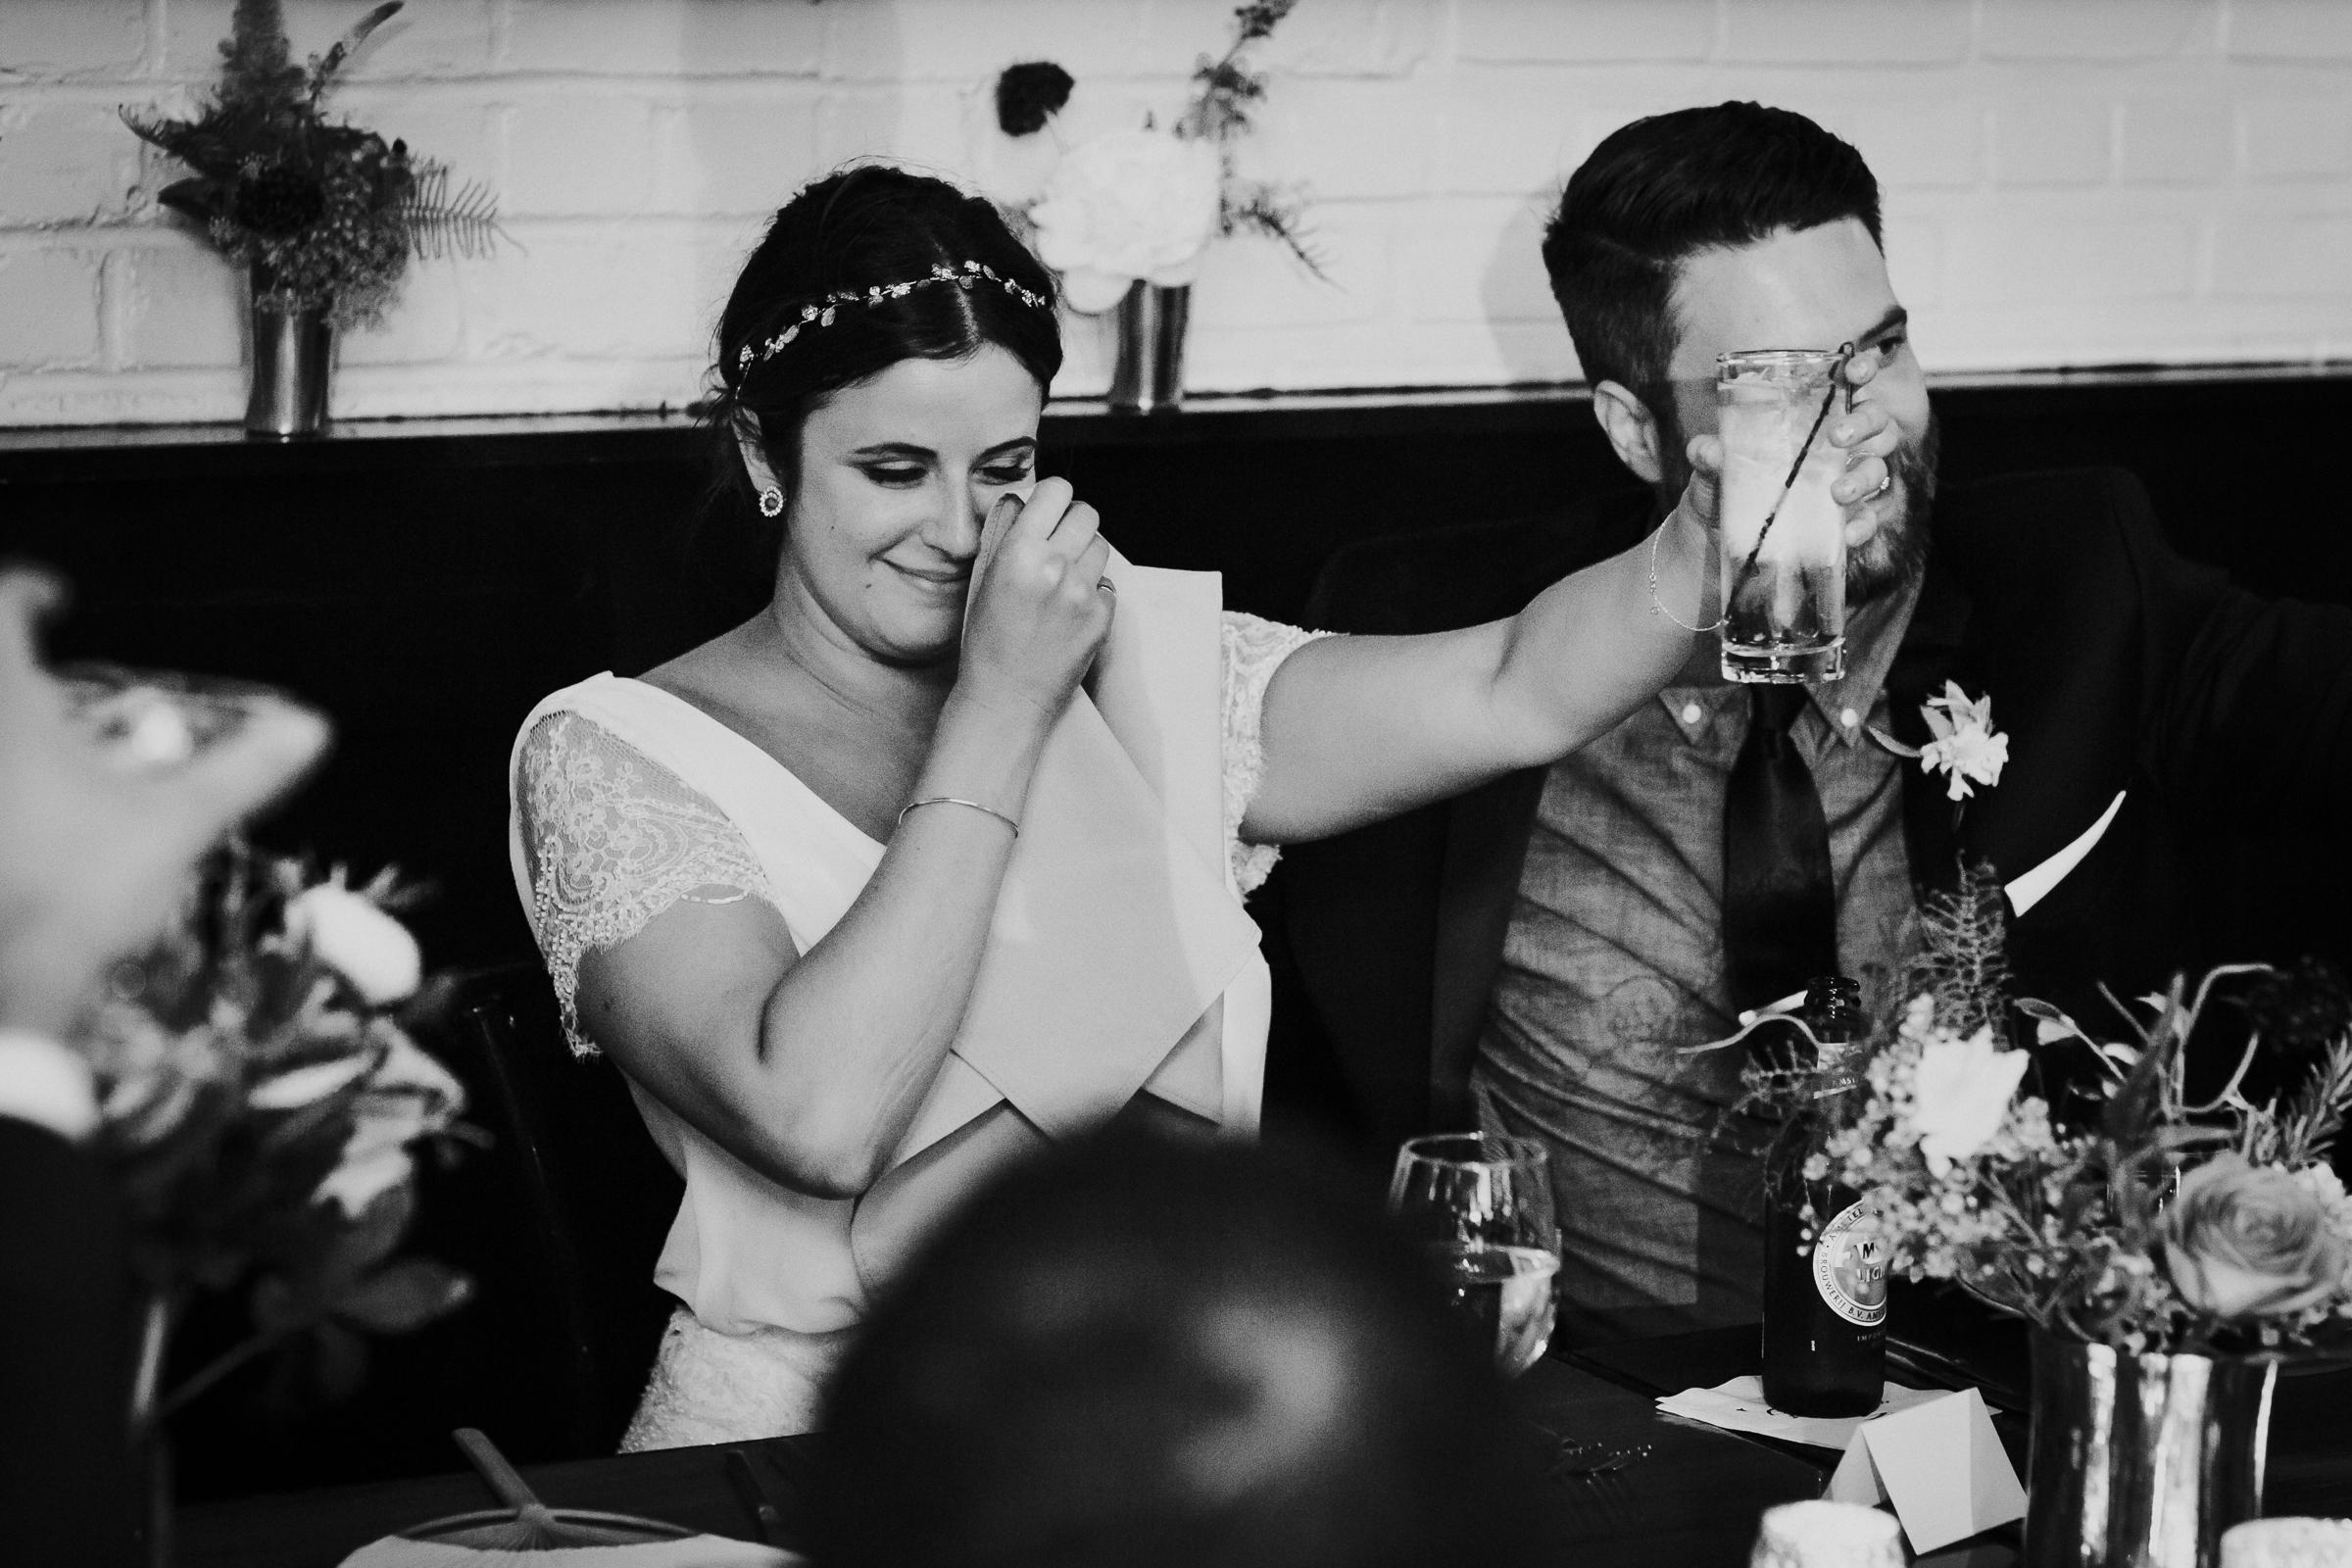 501-Union-Brooklyn-Fine-Art-Documentary-Wedding-Photographer-126.jpg